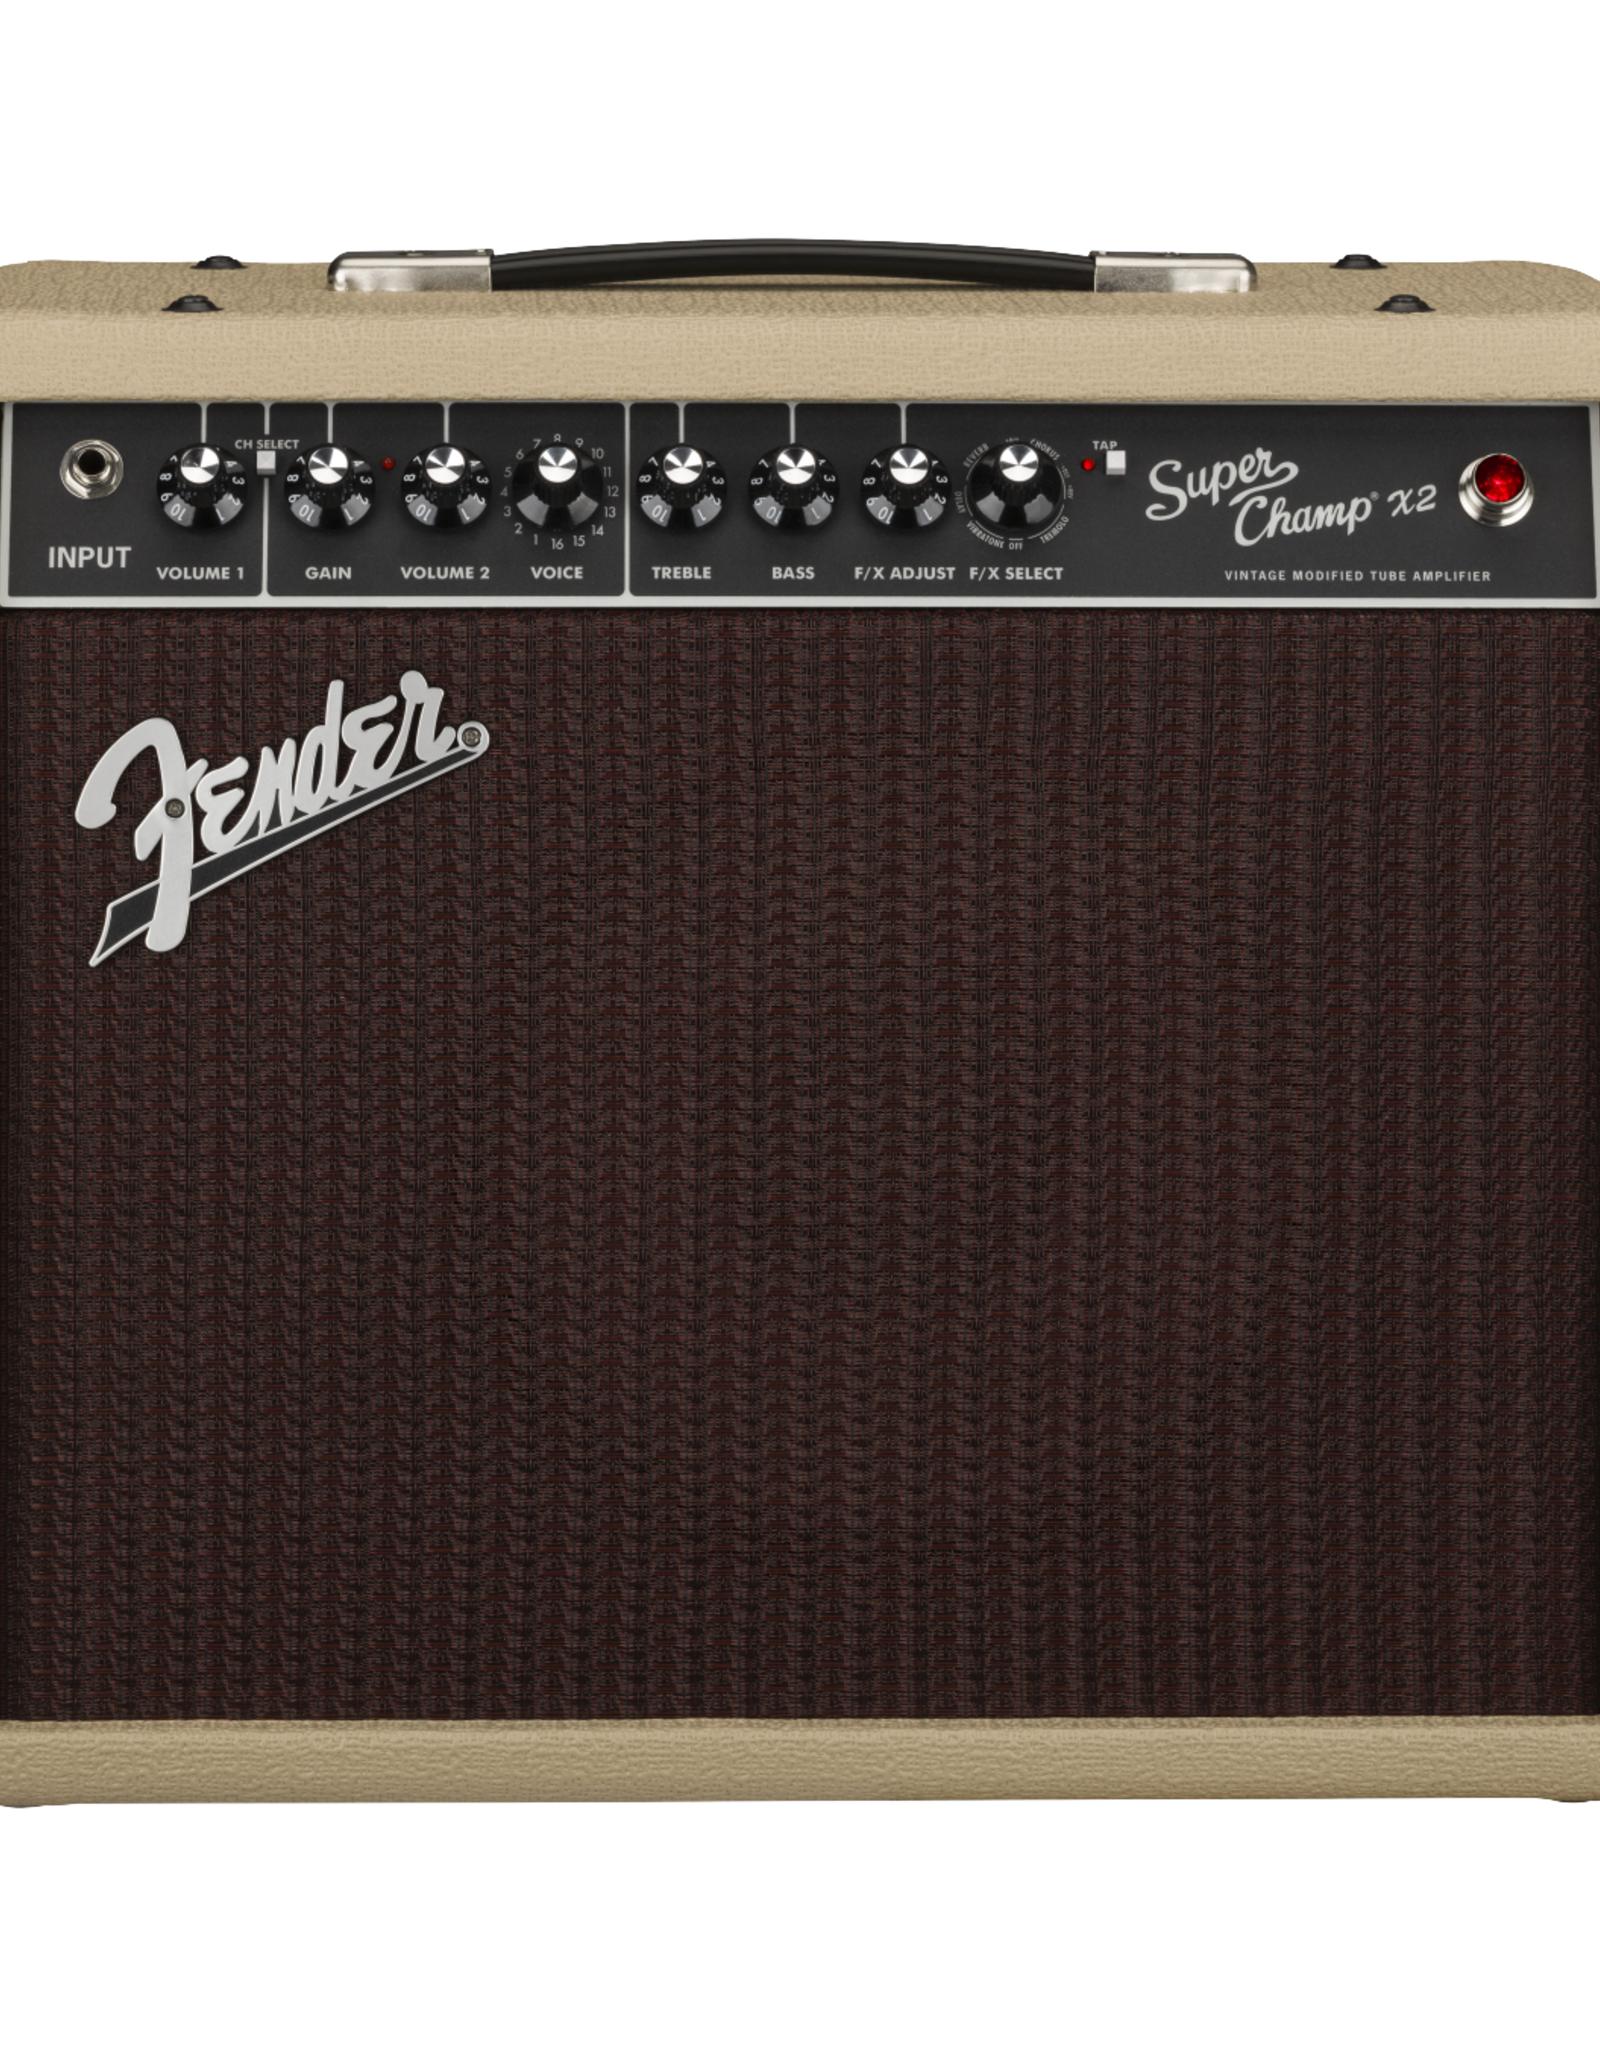 "Fender Fender 2020 Limited Edition Super Champ X2 Ragin"" Cajun, Blonde"